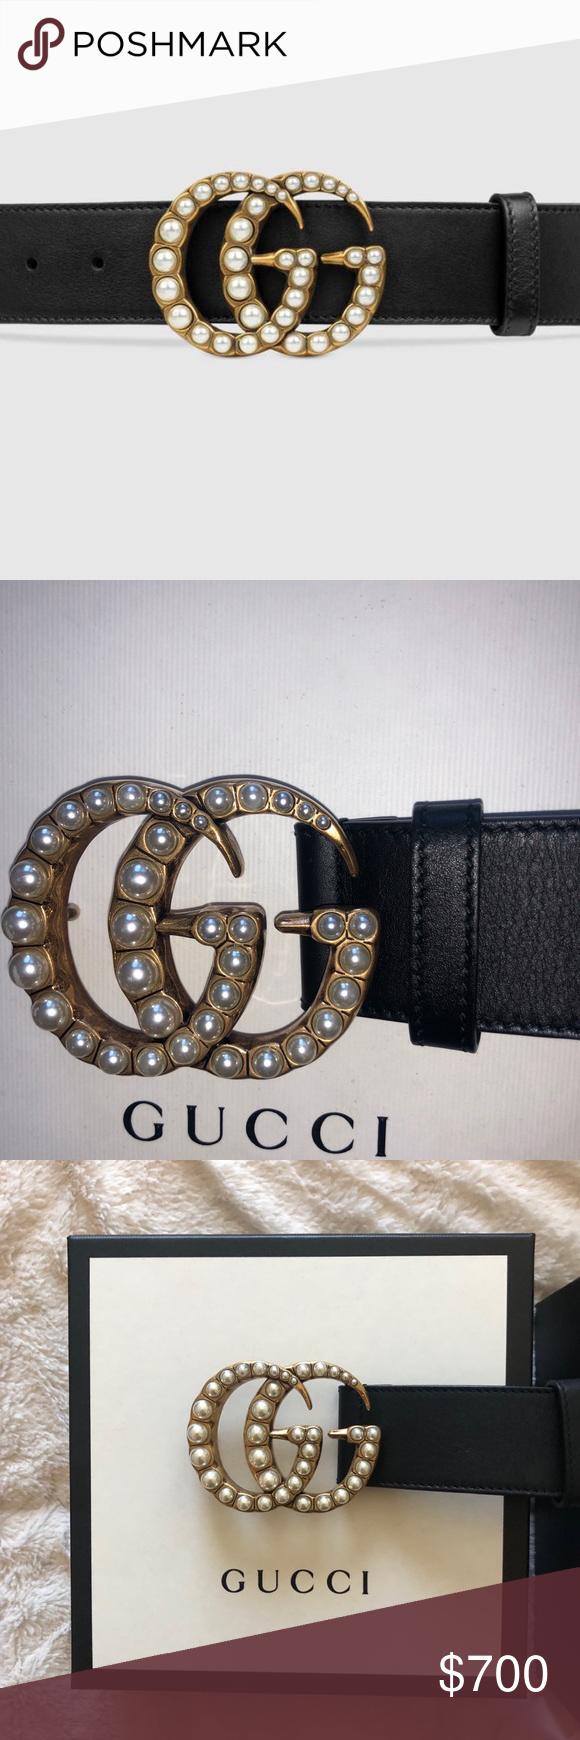 Gucci Belt Gucci Belt Gucci Black Black Gucci Belt